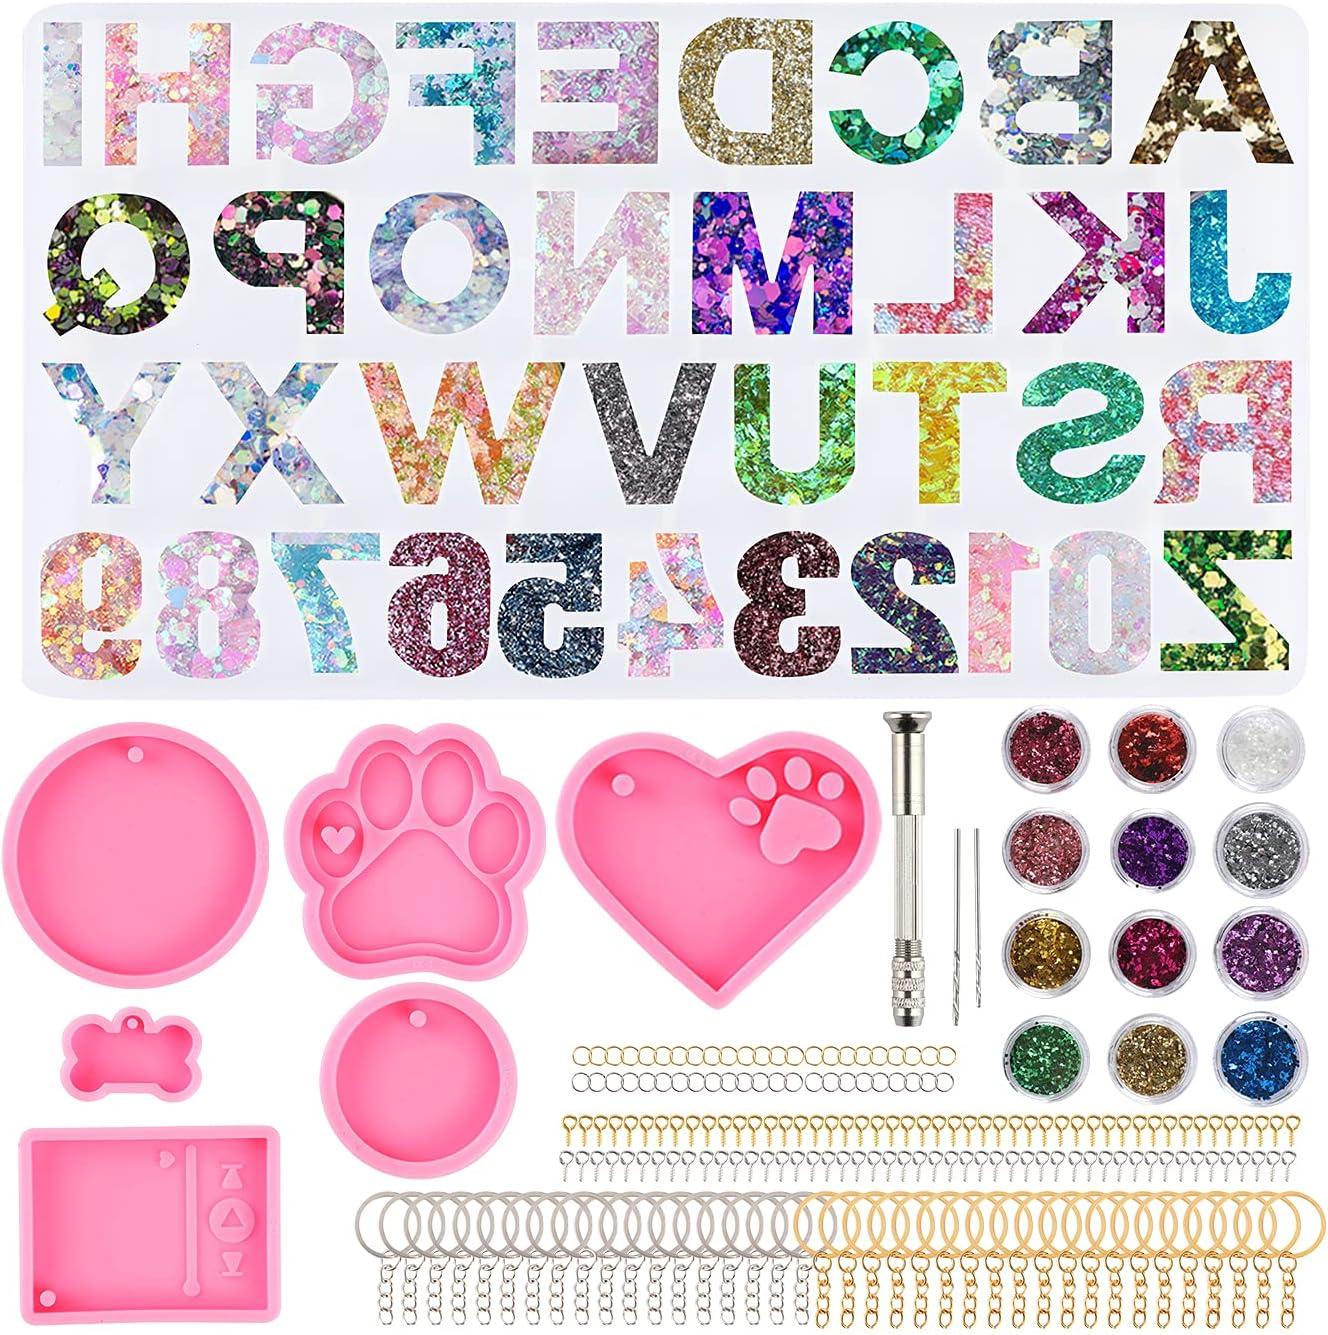 262Pcs Alphabet Epoxy Resin Keychain online shop - Kit Silicone Molds gift